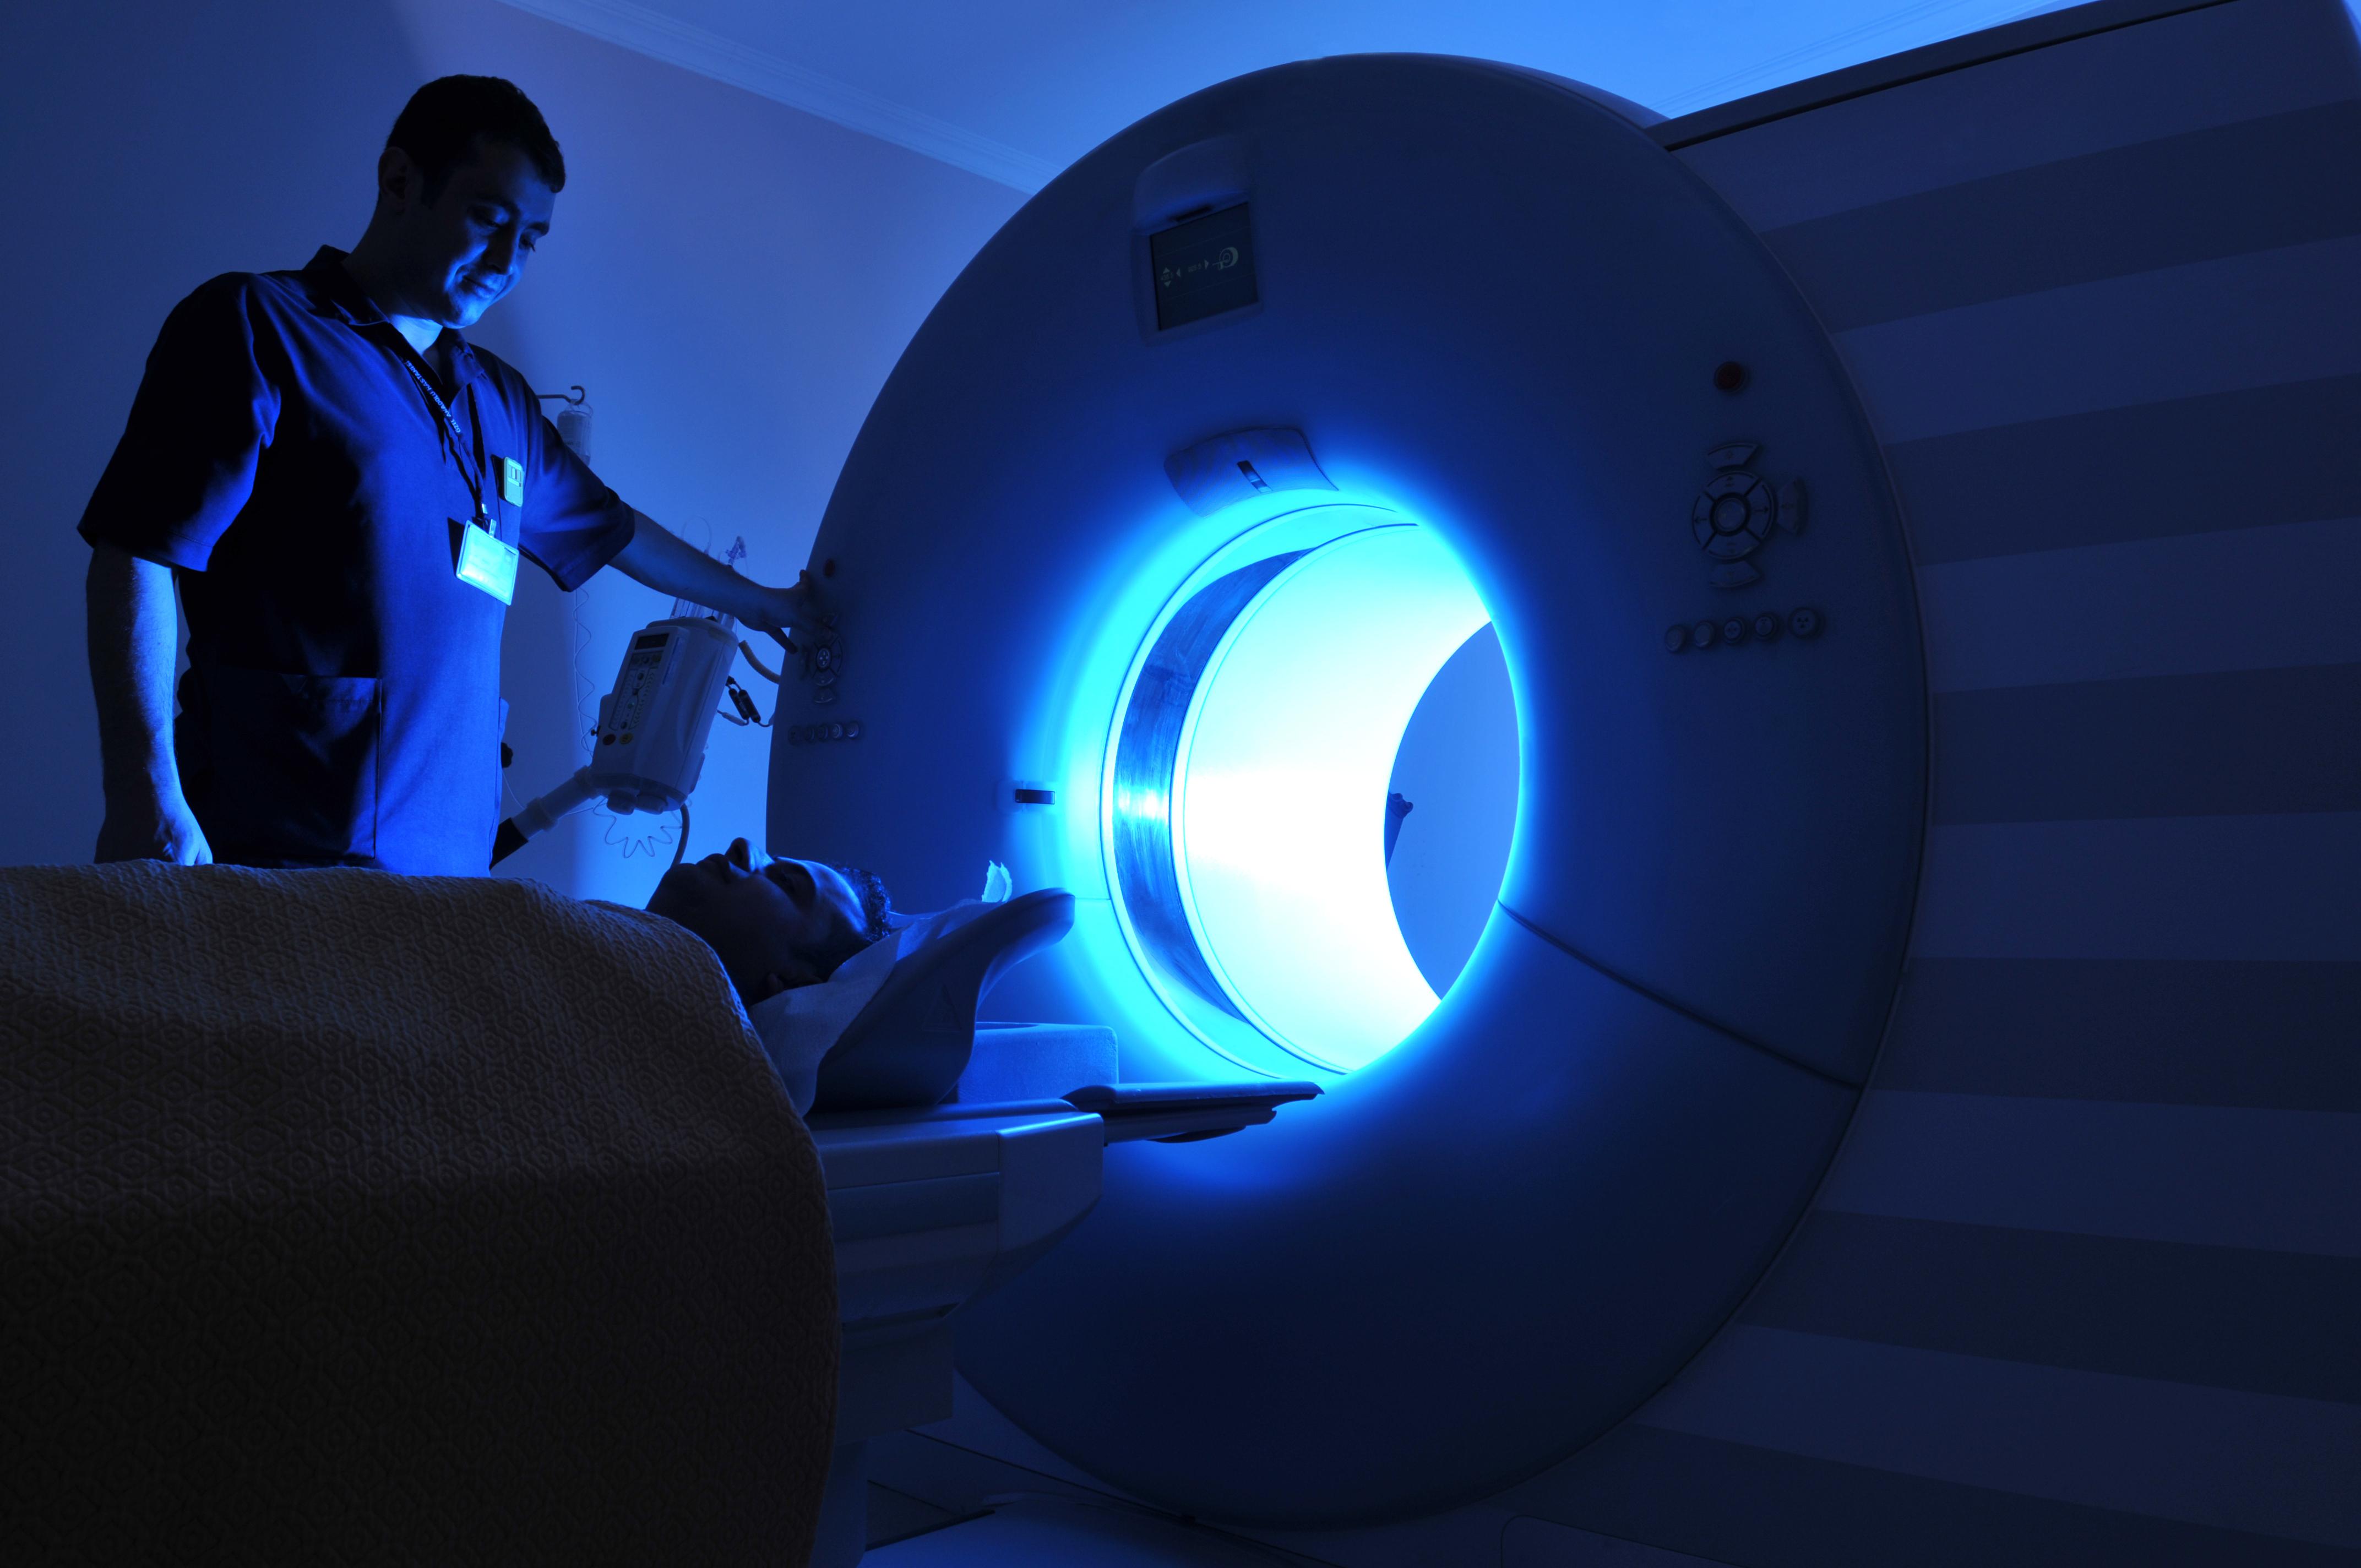 a tech instructs patient before MRI procedure